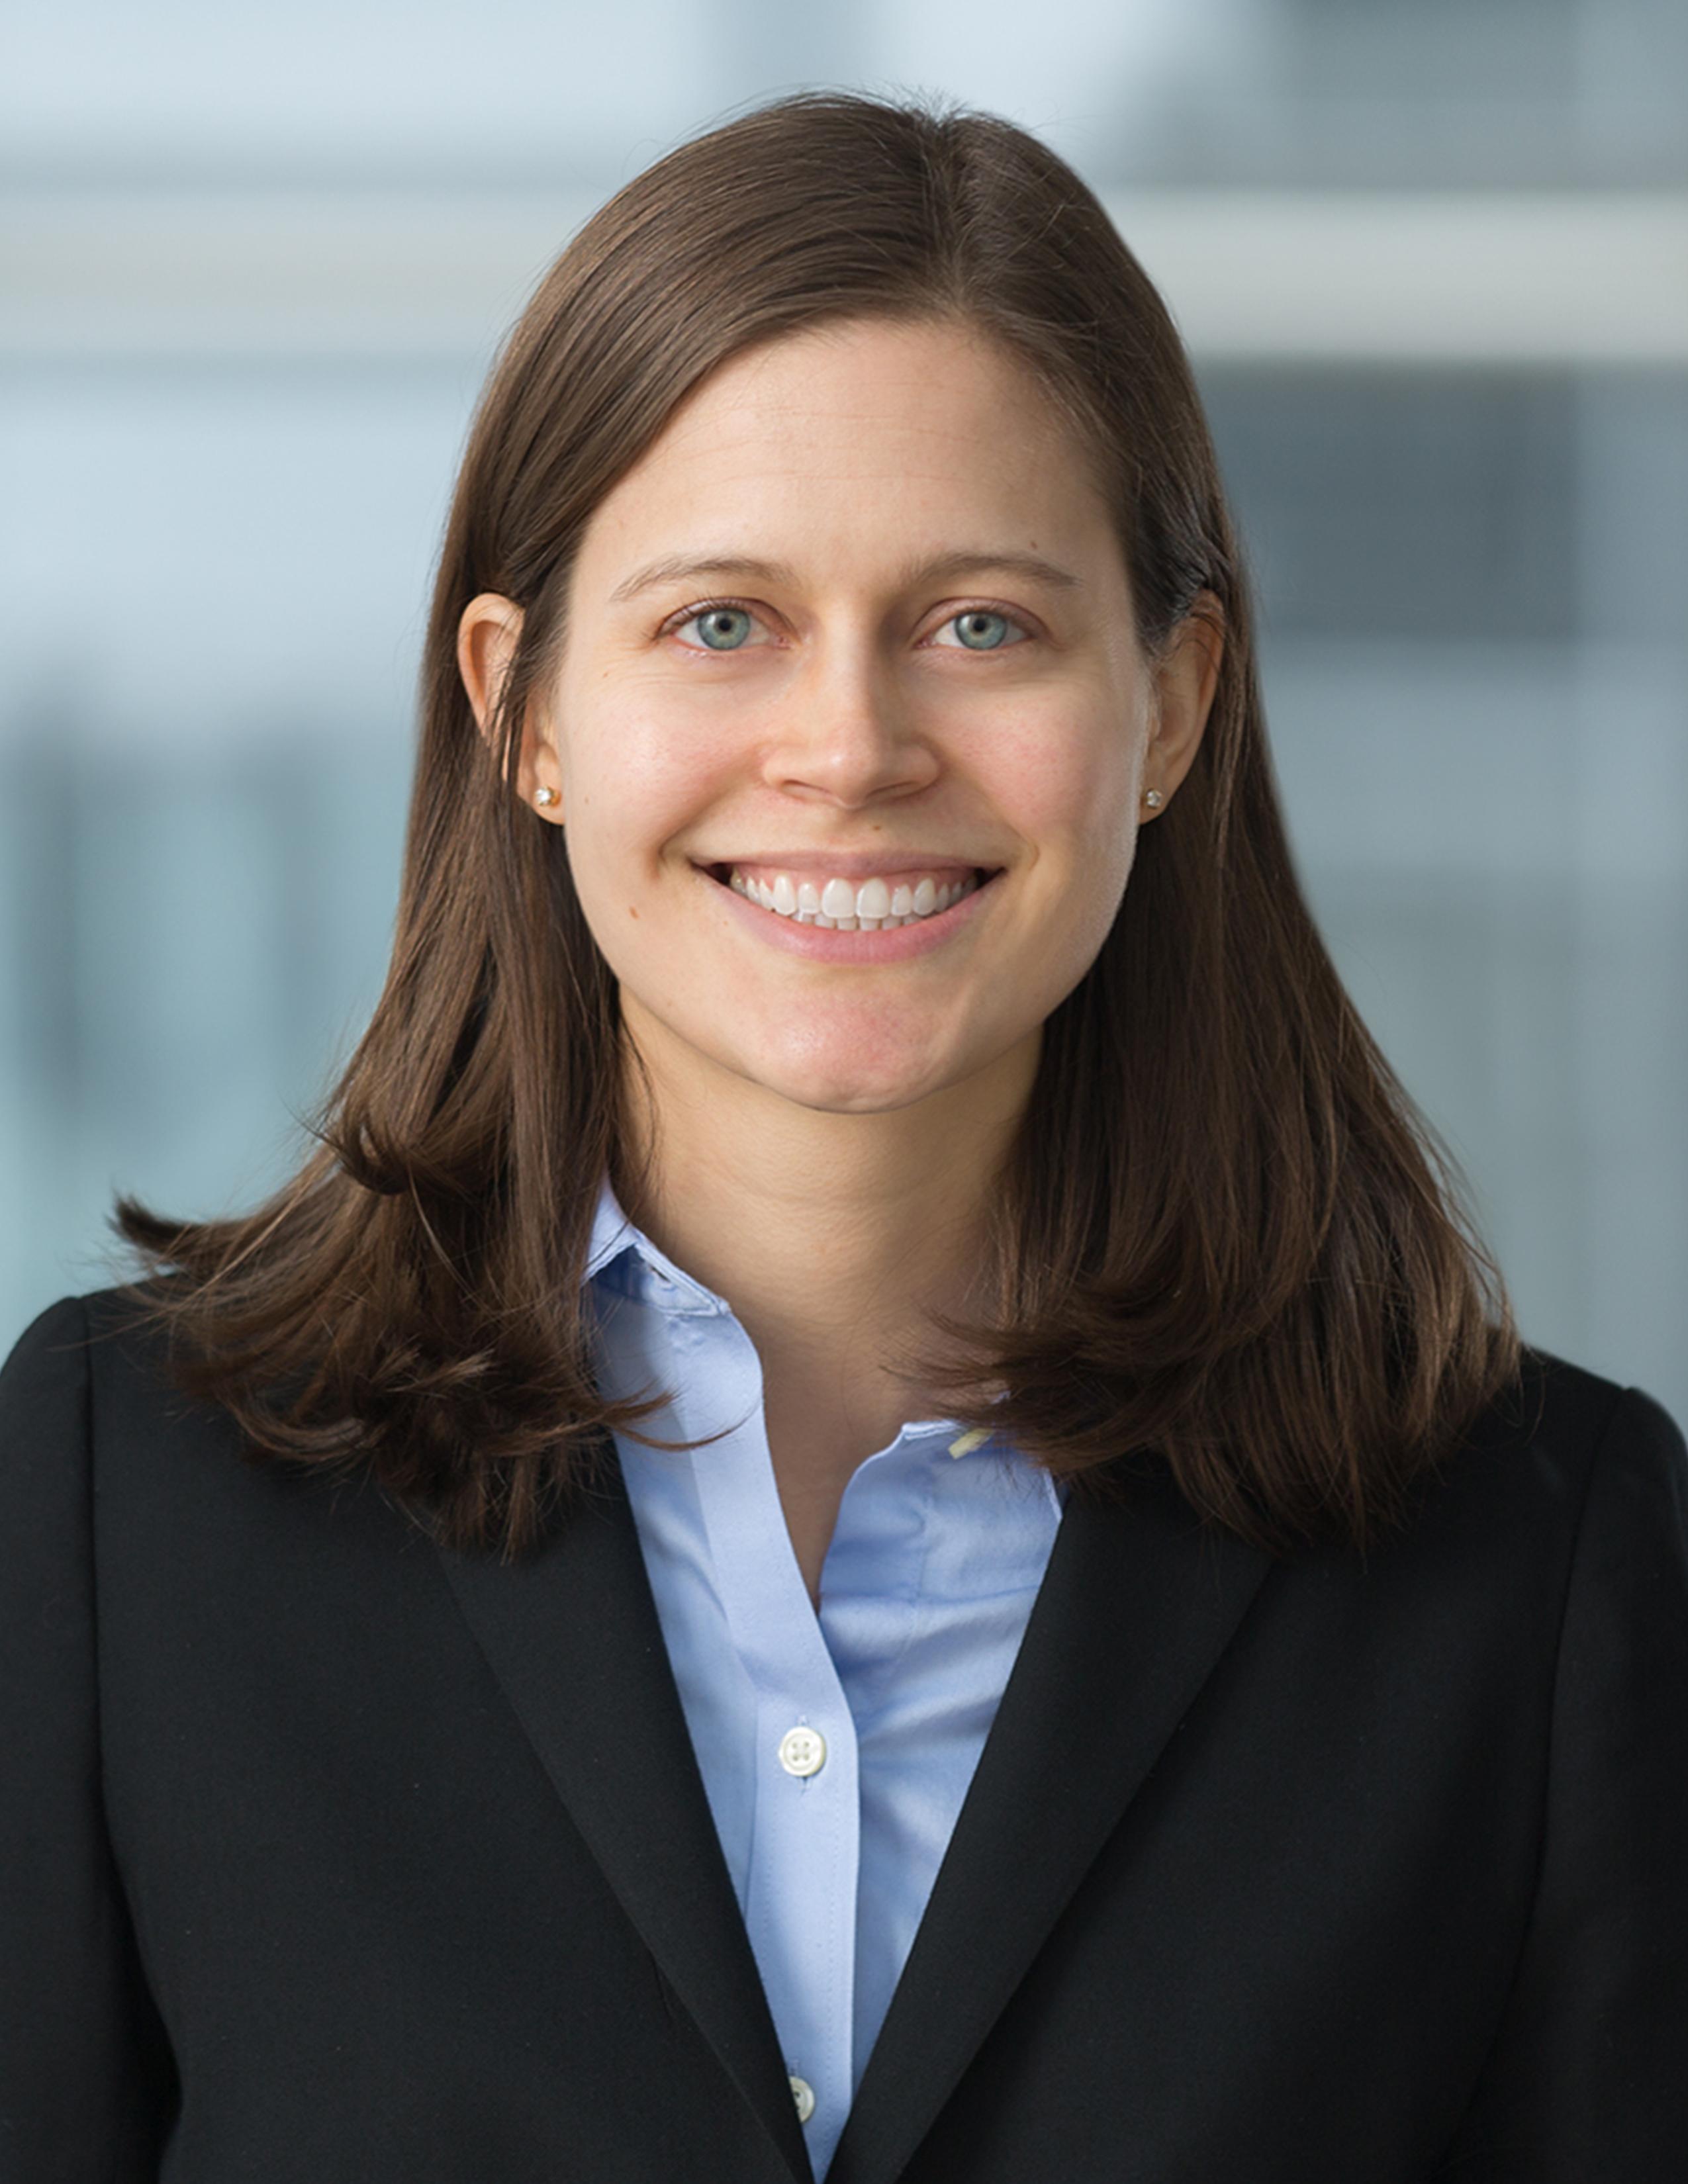 Sarah E. Jelsema*